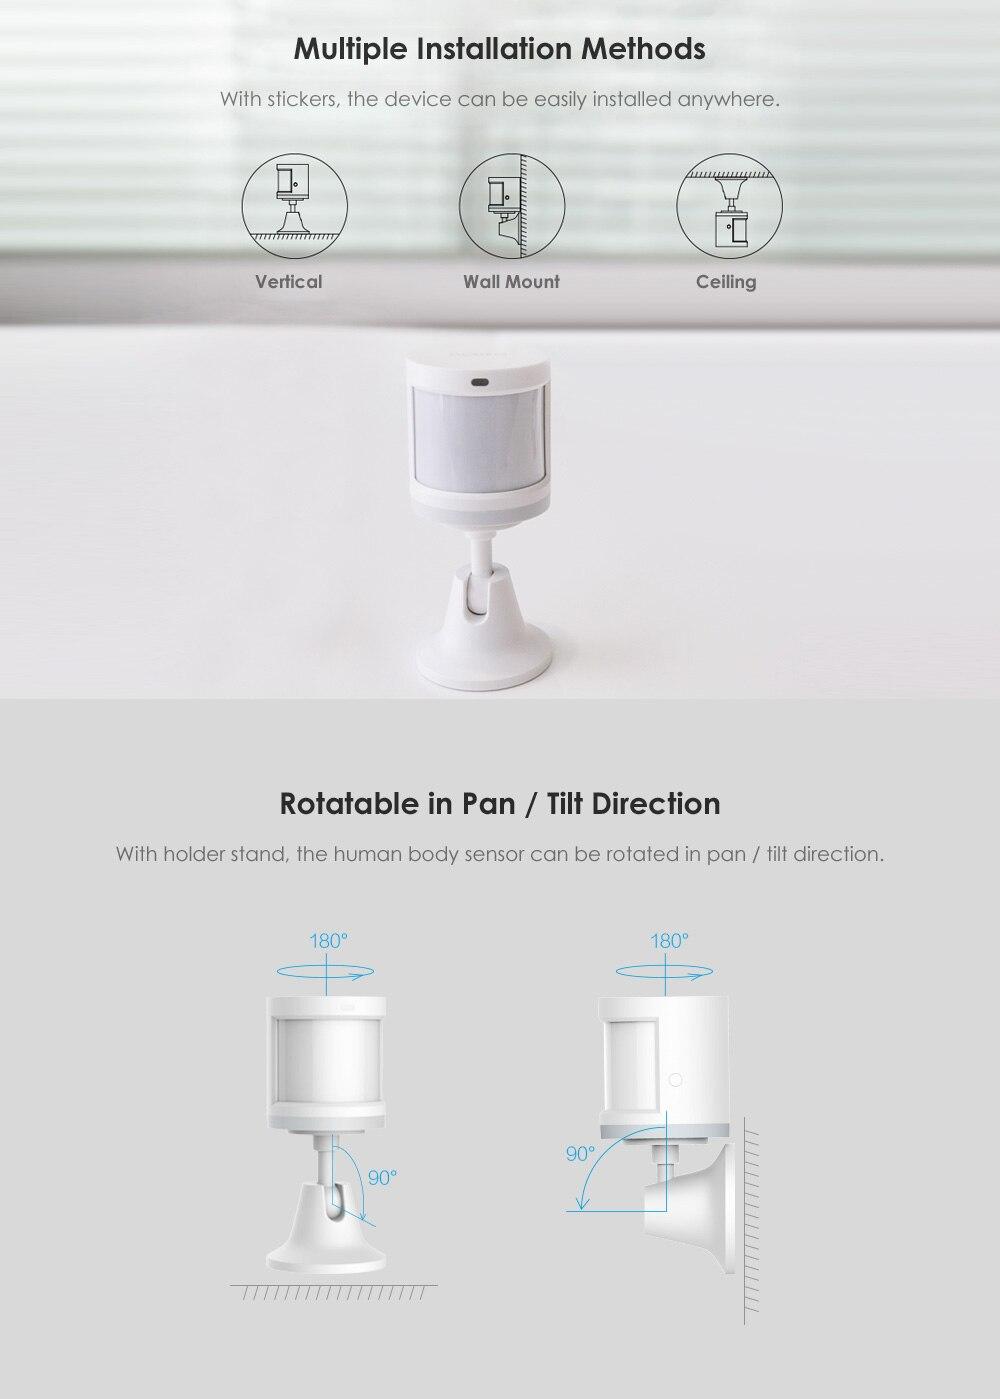 Xiaomi Aqara Body Sensor&Light Intensity Sensors, Zigbee Wireless WiFi With Holder Smart Mi Home APP for Gateway Hub iOSAndroid (31)